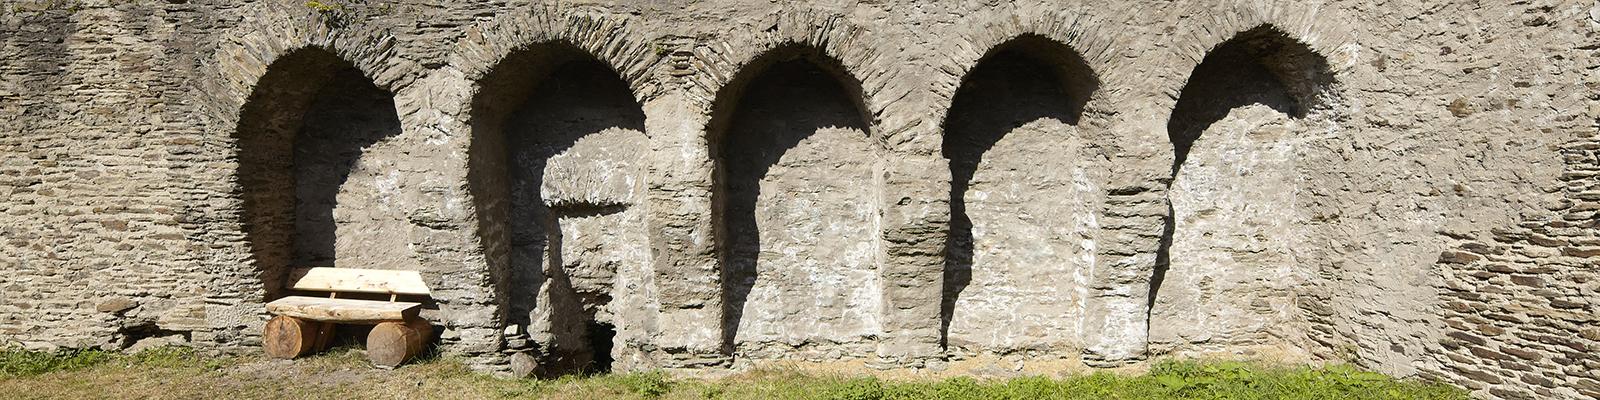 Ruine Sporkenburg © GDKE, U. Pfeuffer